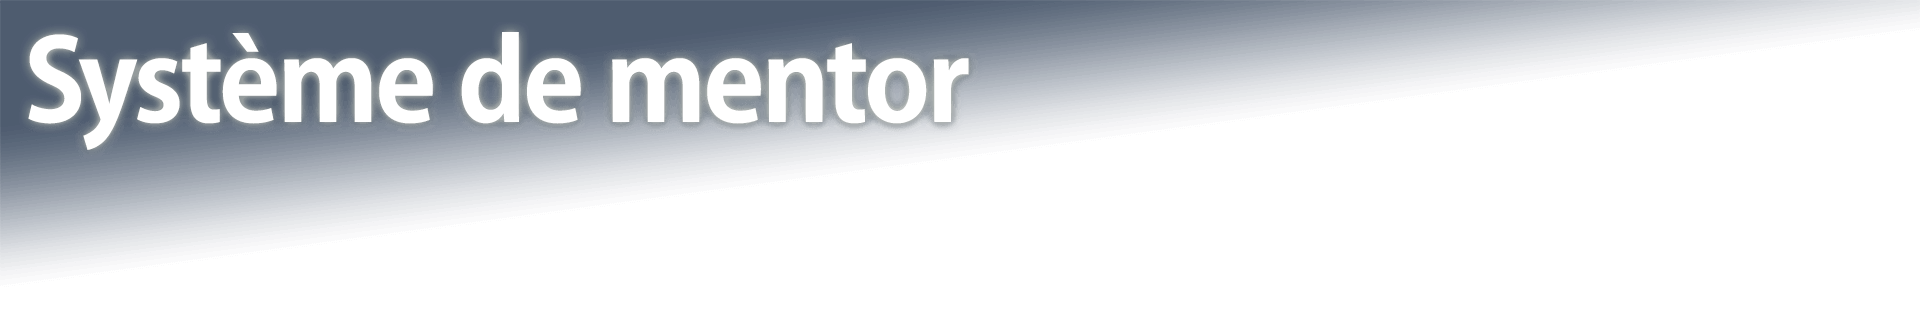 Système de mentor